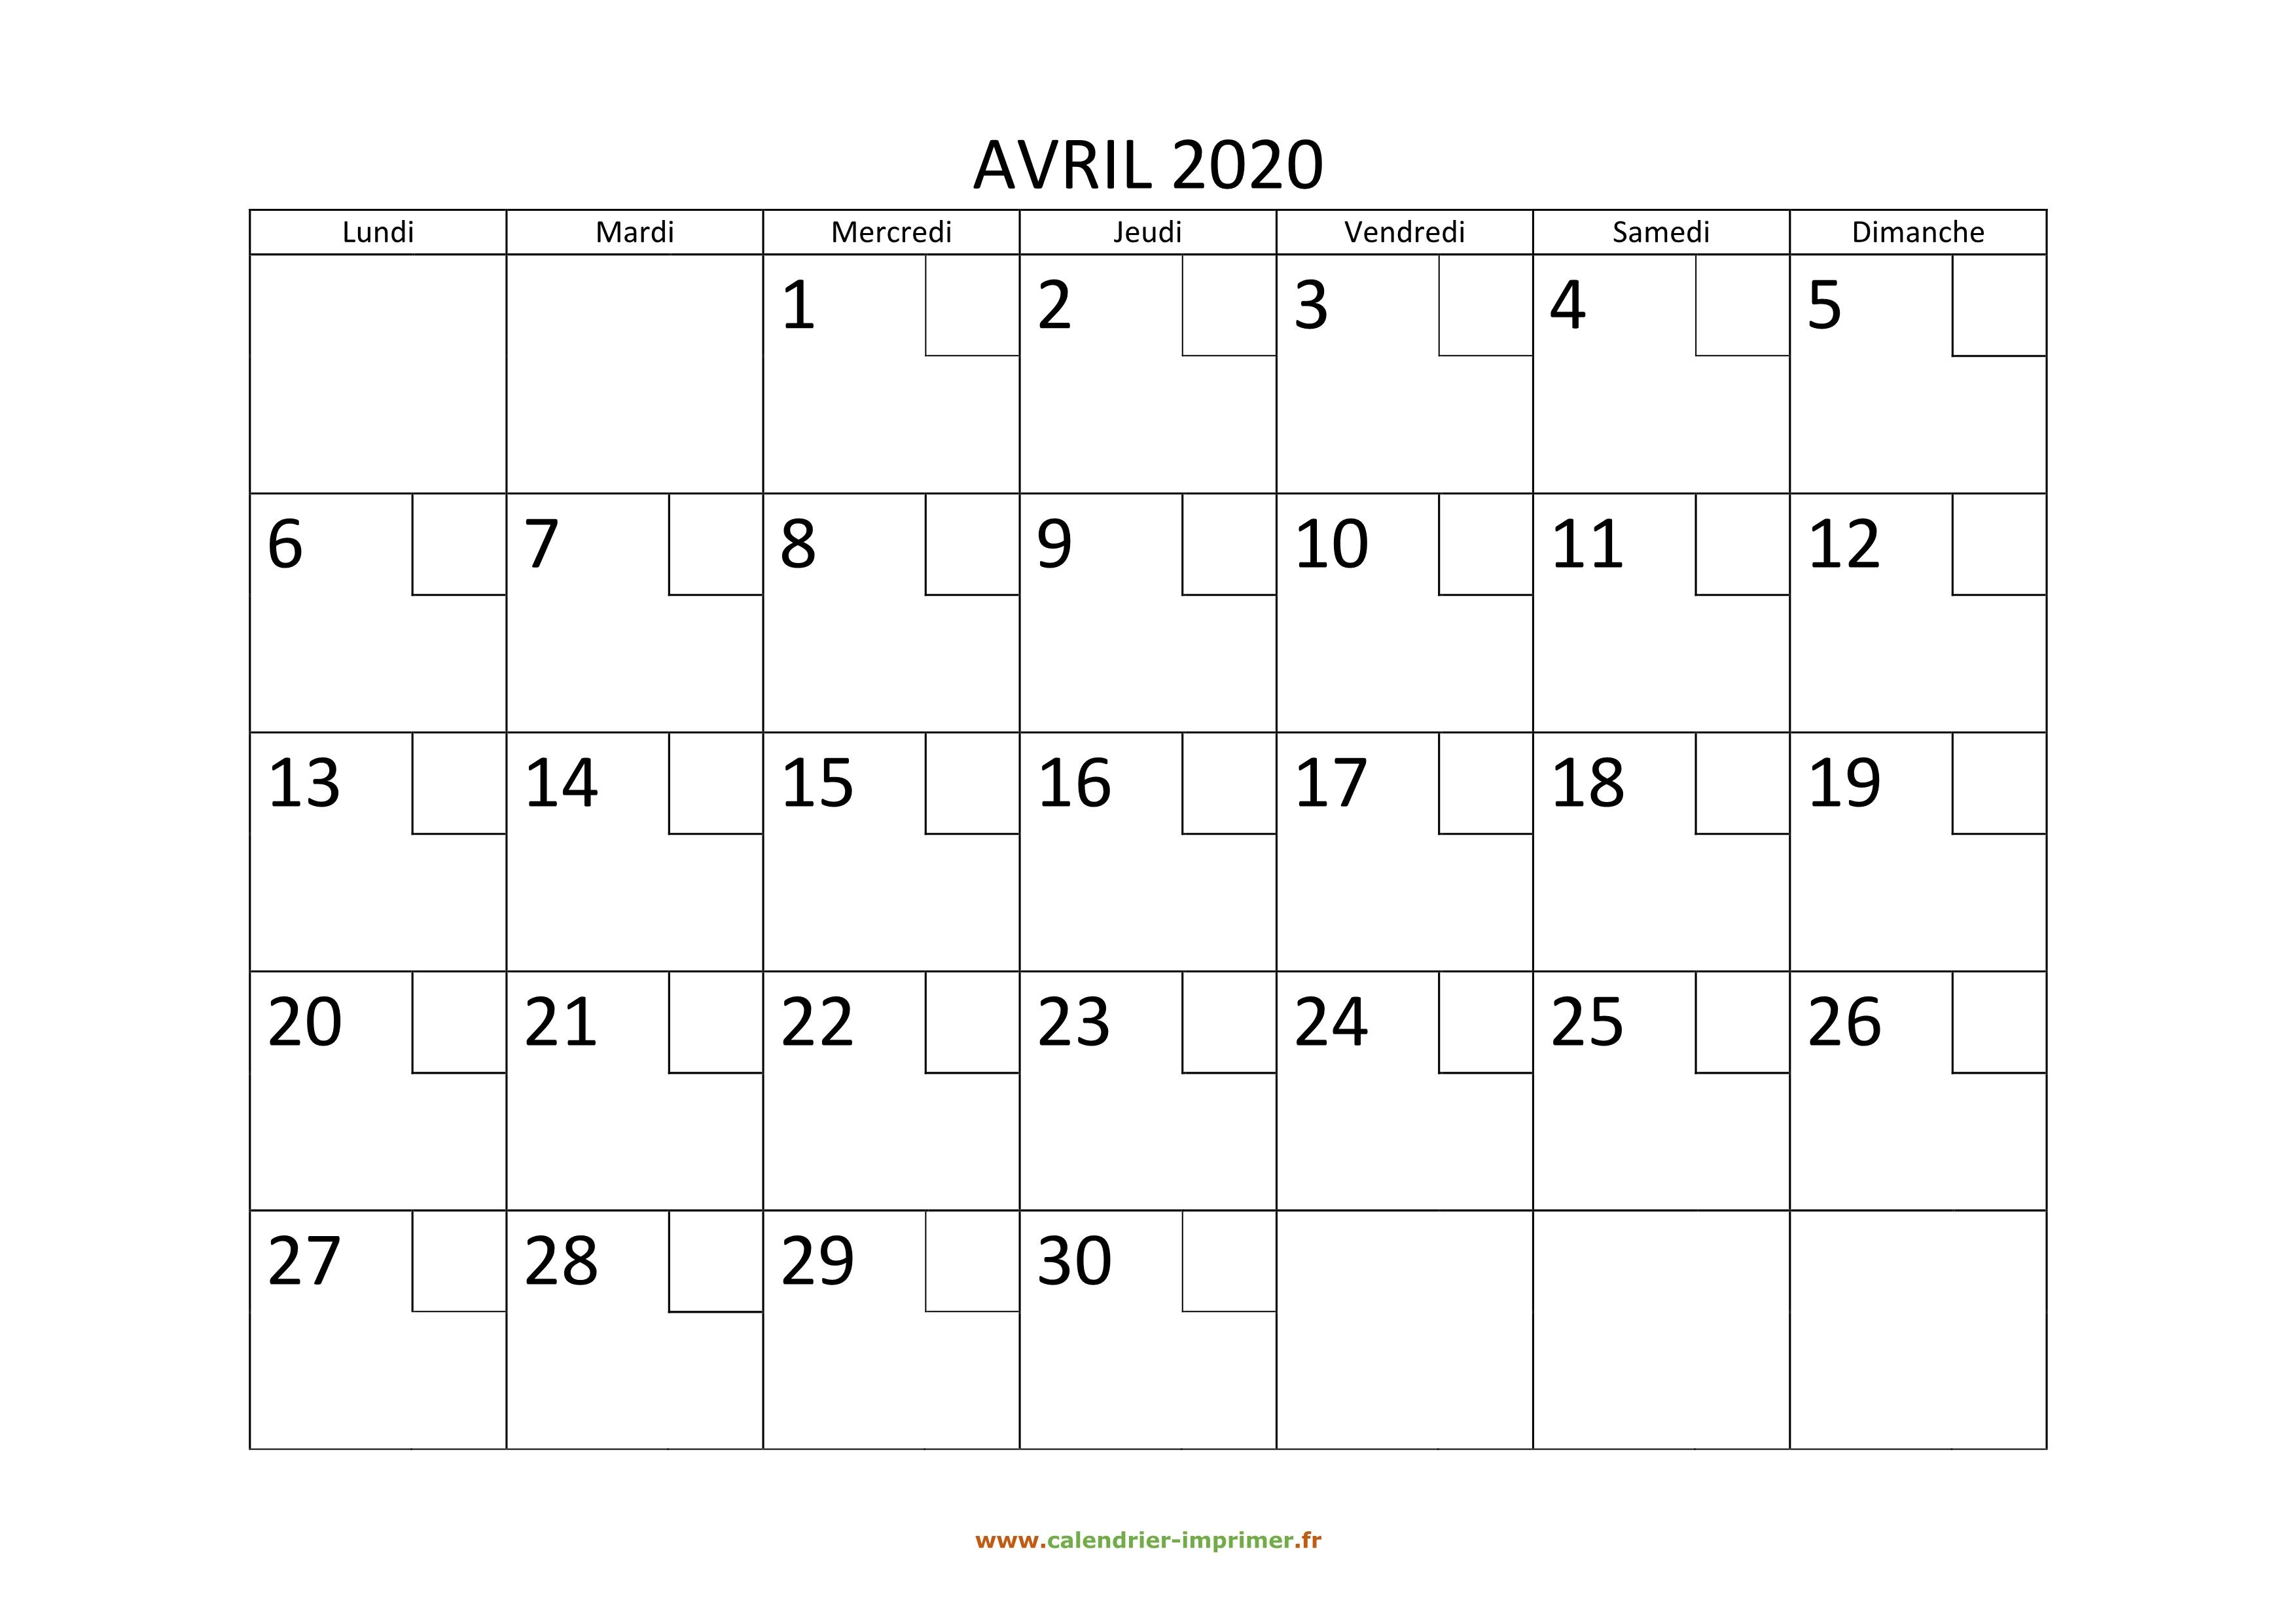 Calendrier Avril 2020 à Imprimer.Calendrier Avril 2020 A Imprimer